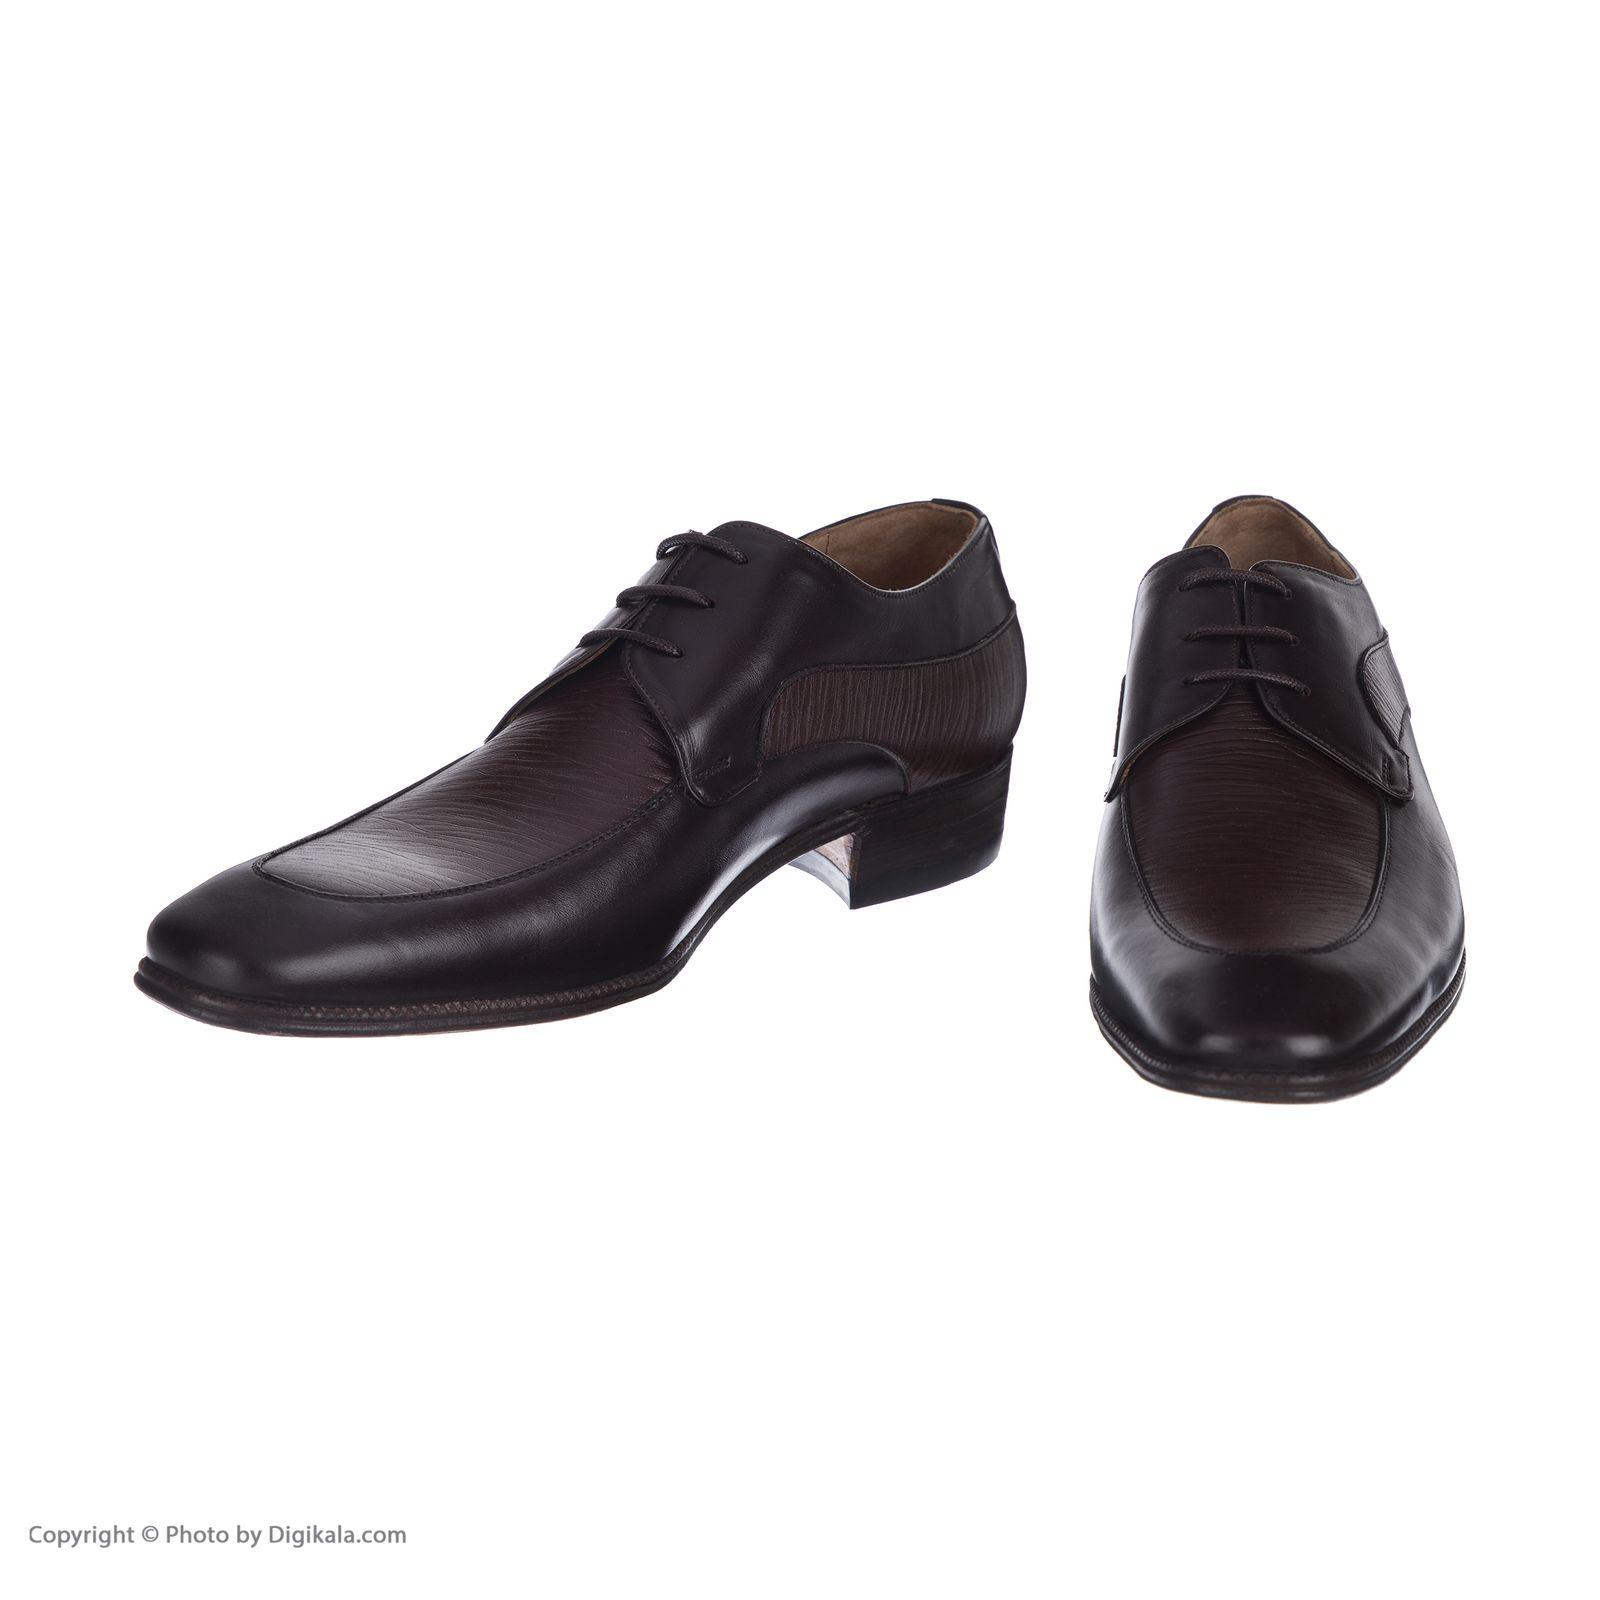 کفش مردانه نظری کد 429 -  - 4